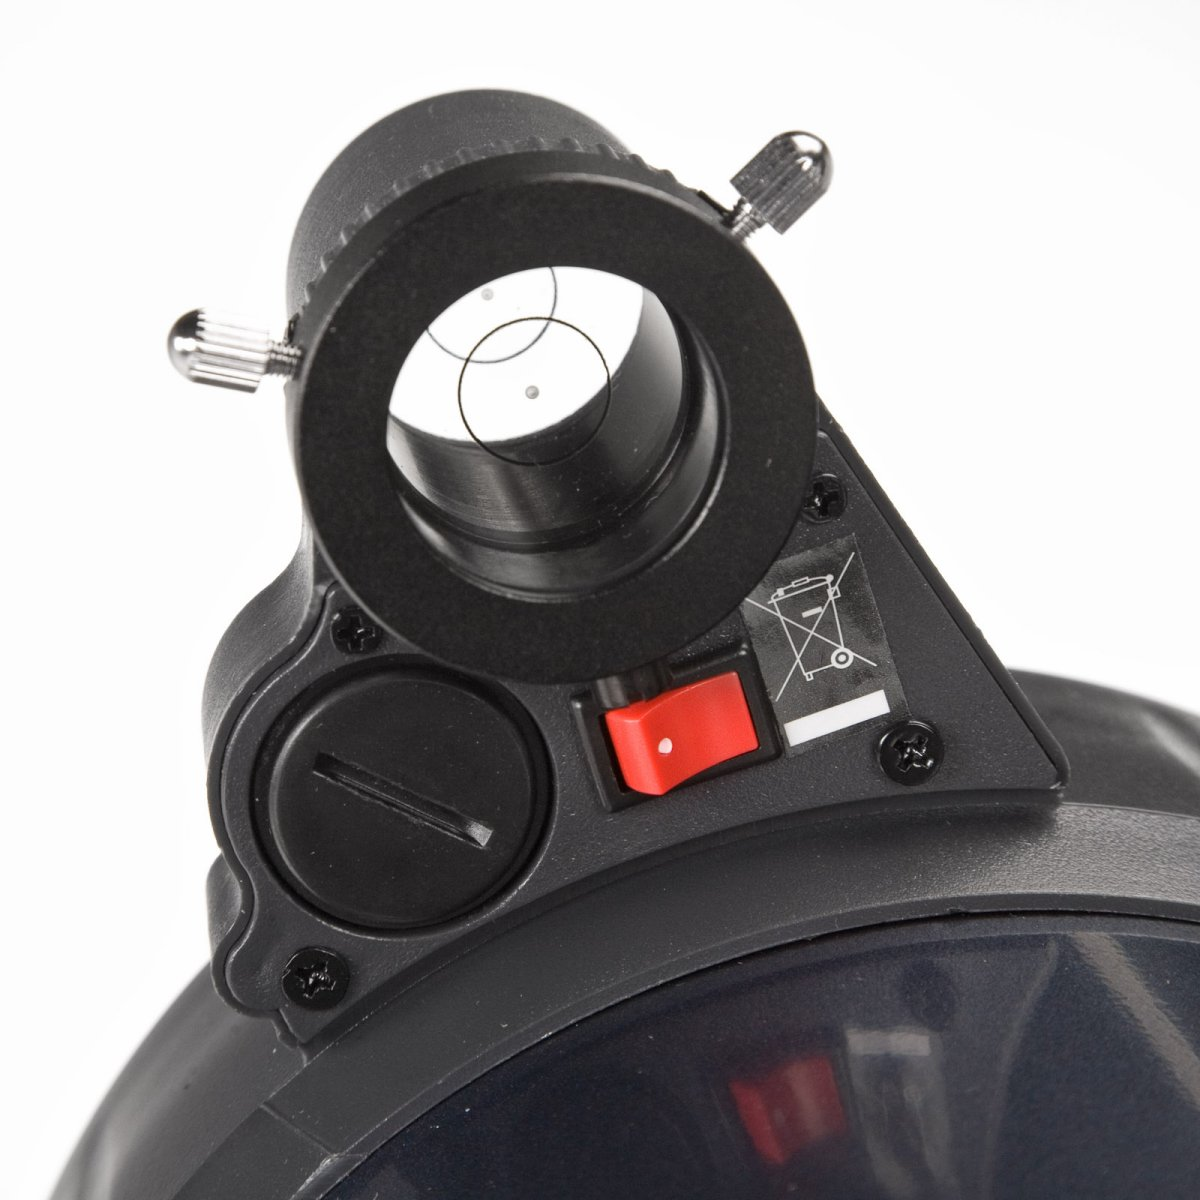 Celestron astromaster 130eq astro stargazing astronomy for Astromaster powerseeker motor drive